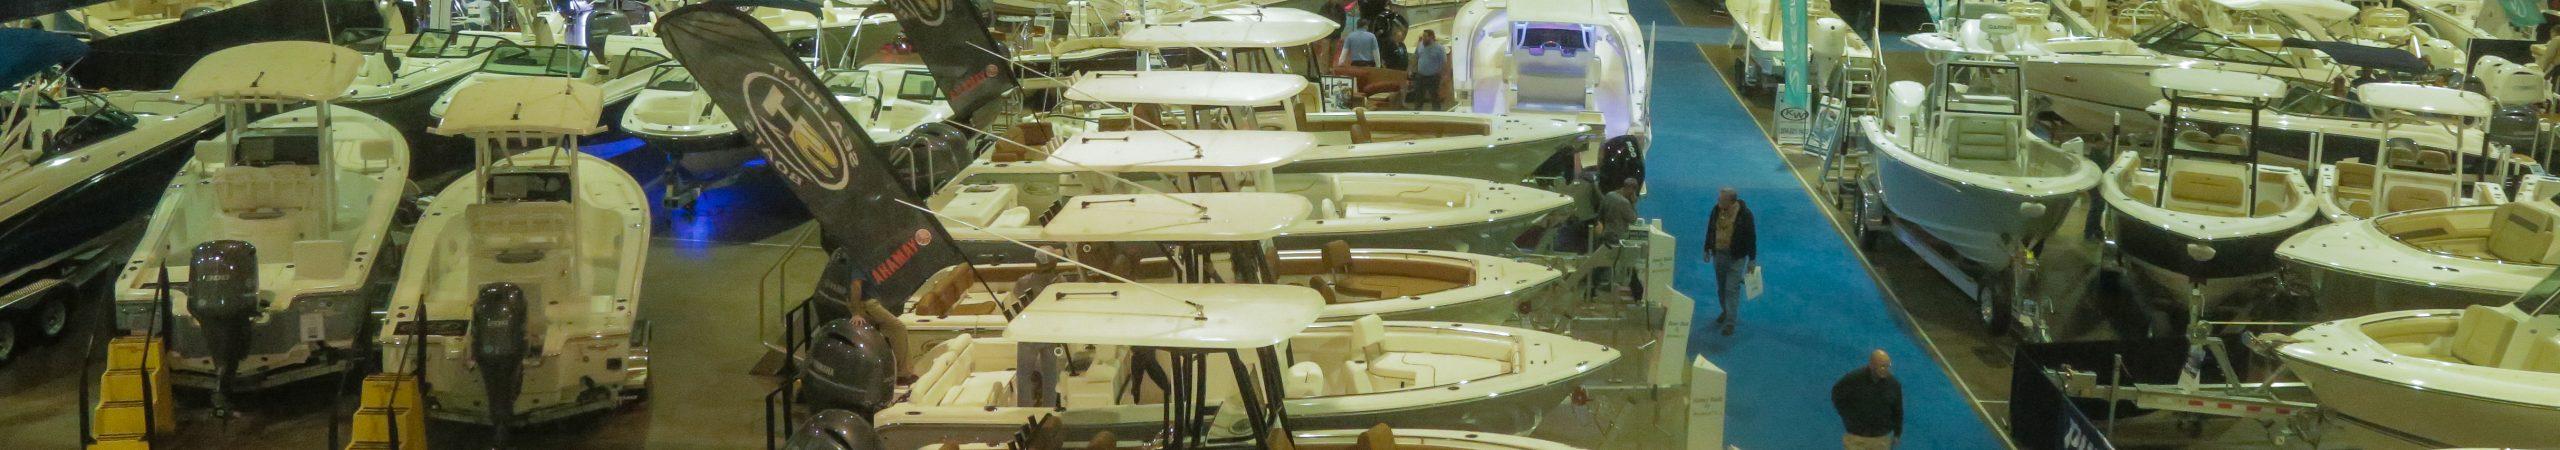 Prime Osborn Boat Show